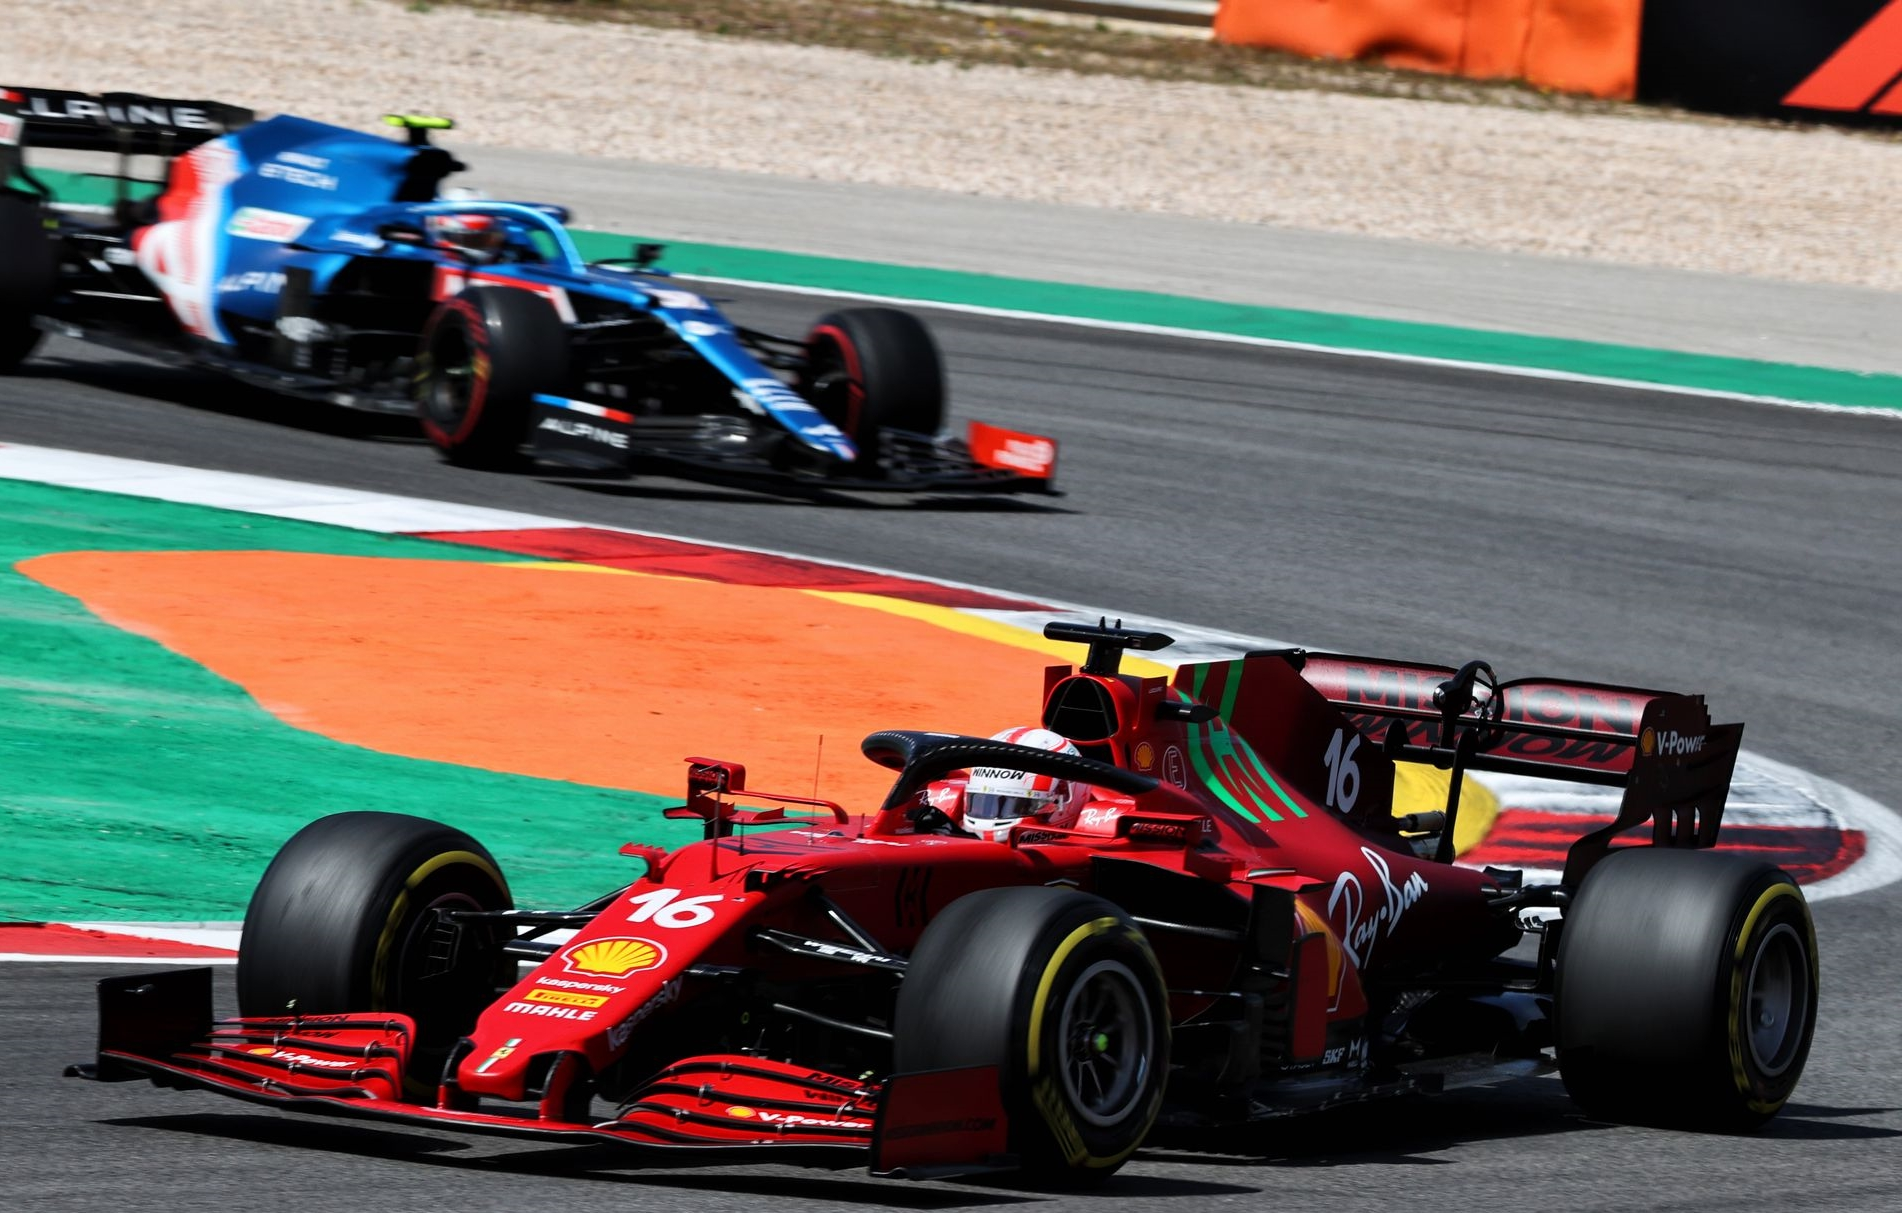 perché la Ferrari era cosi lenta in Francia?